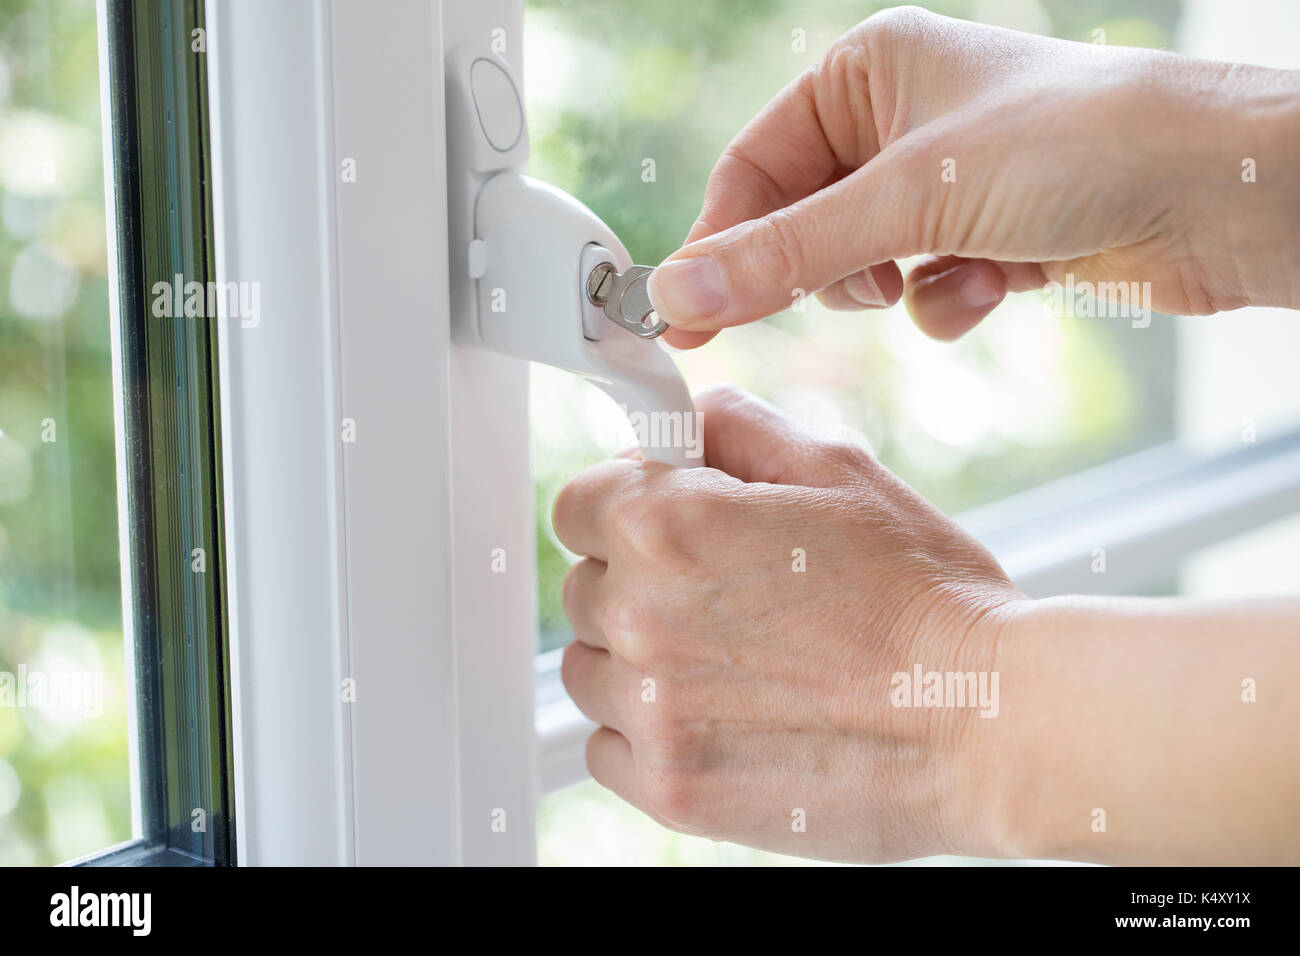 Super Fenstersperre Stockfotos & Fenstersperre Bilder - Alamy DZ71